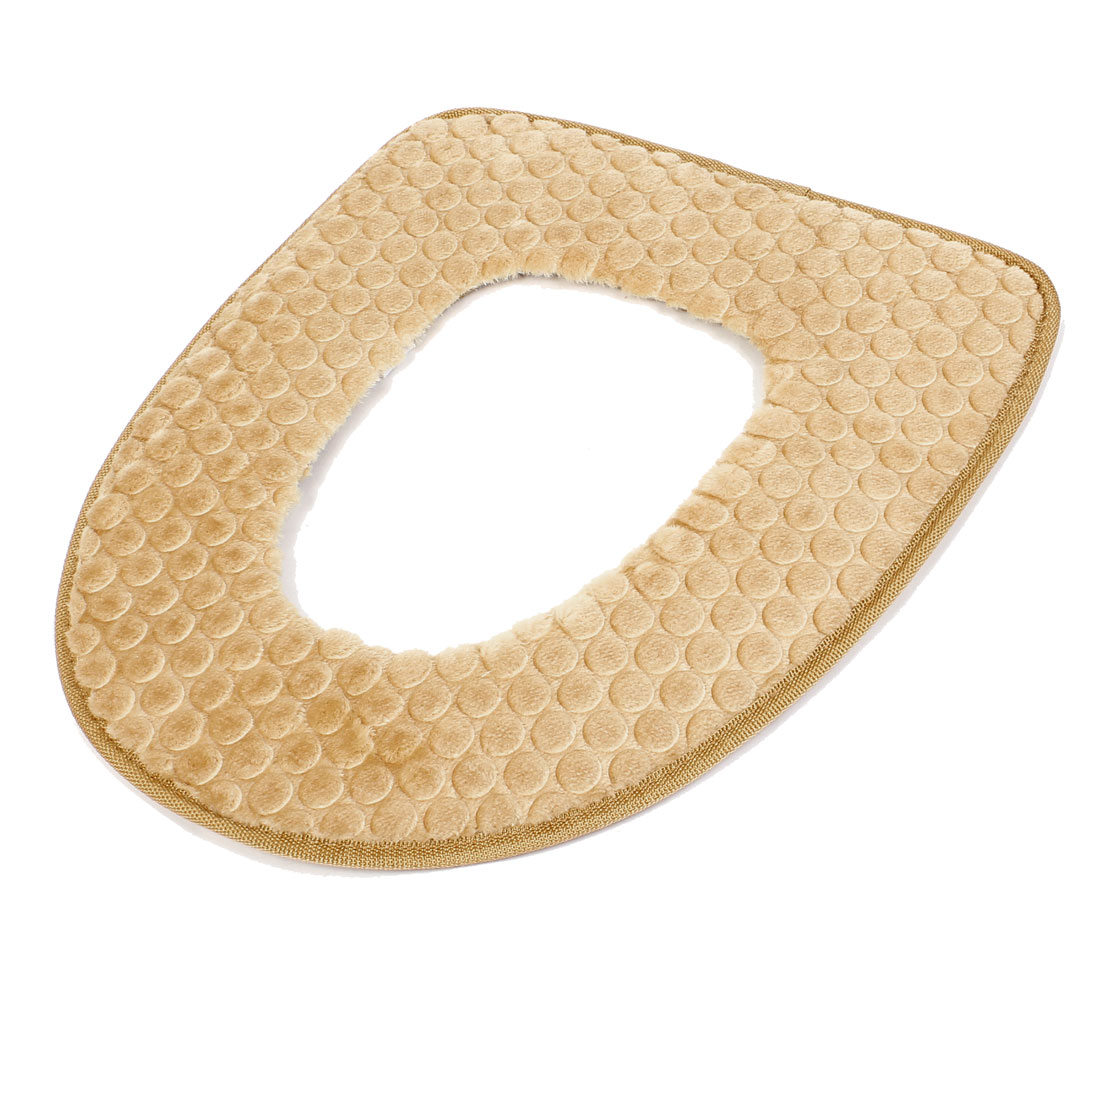 Bathroom Toilet Seat Mat Cover Light Brown Plush Pads Warmer